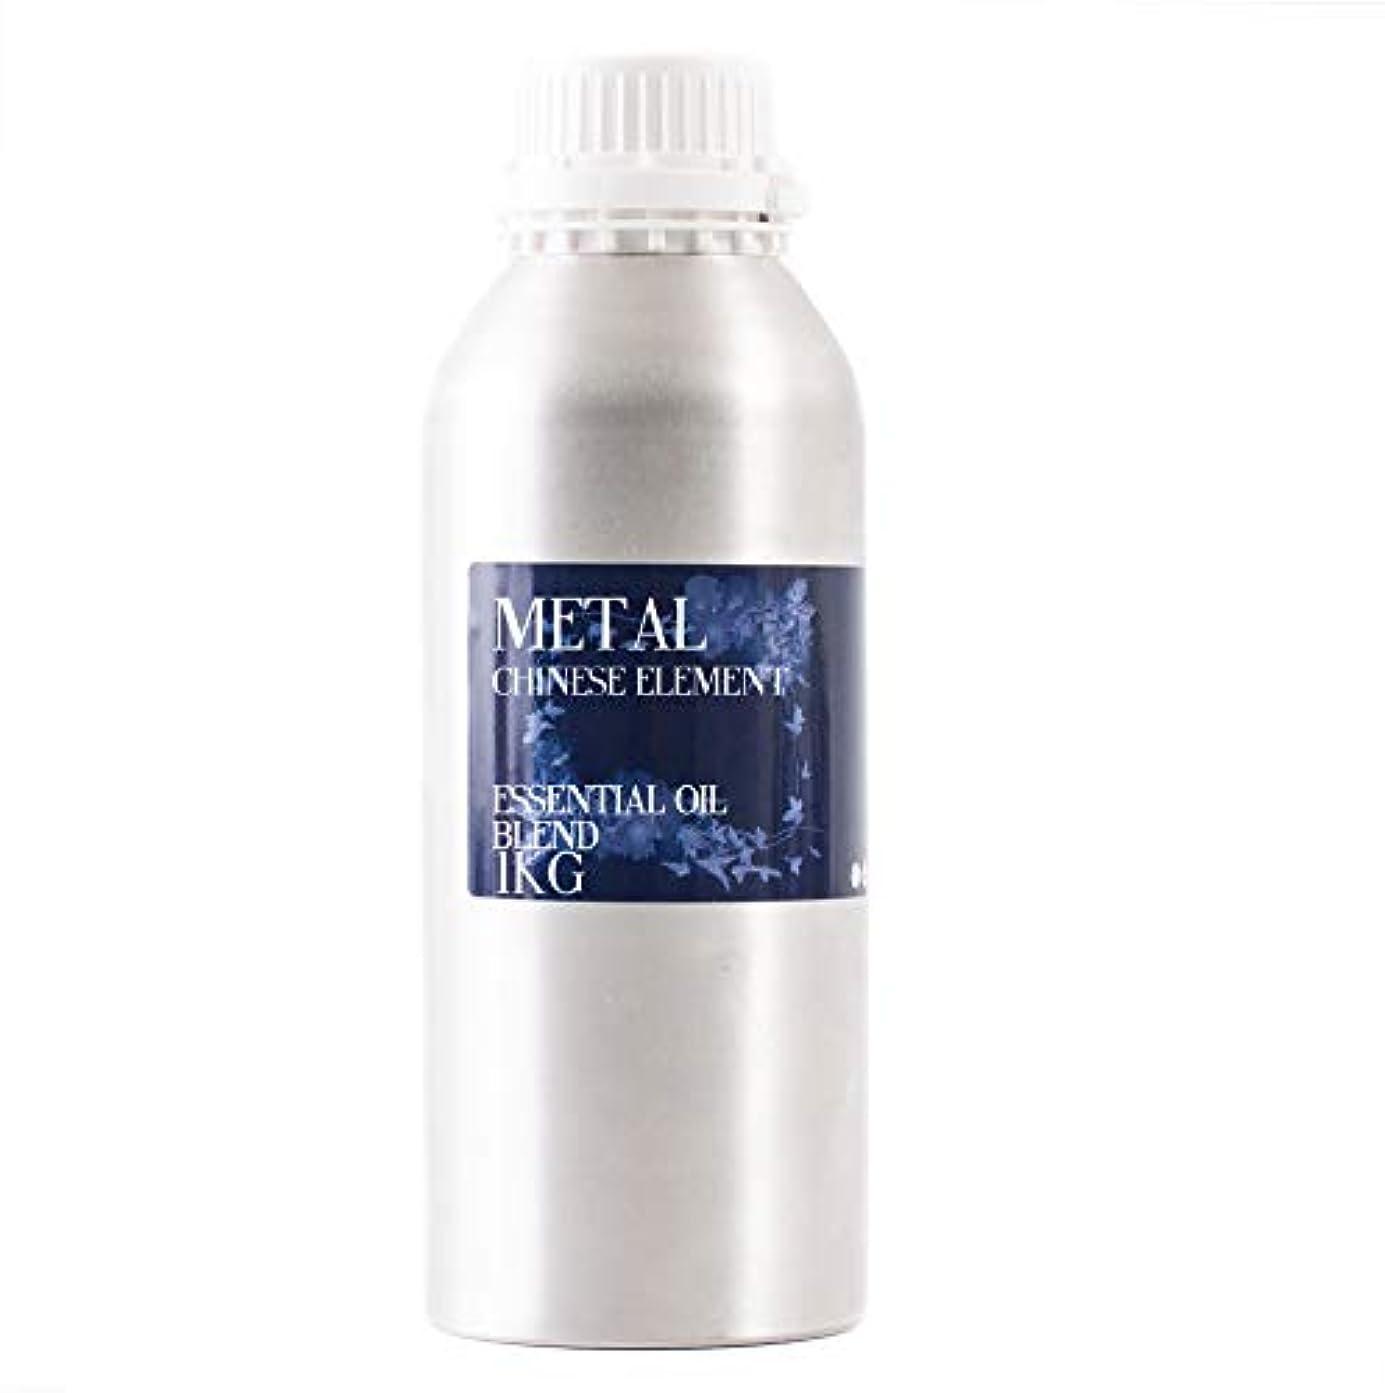 ラフ困難瞑想的Mystix London | Chinese Metal Element Essential Oil Blend - 1Kg